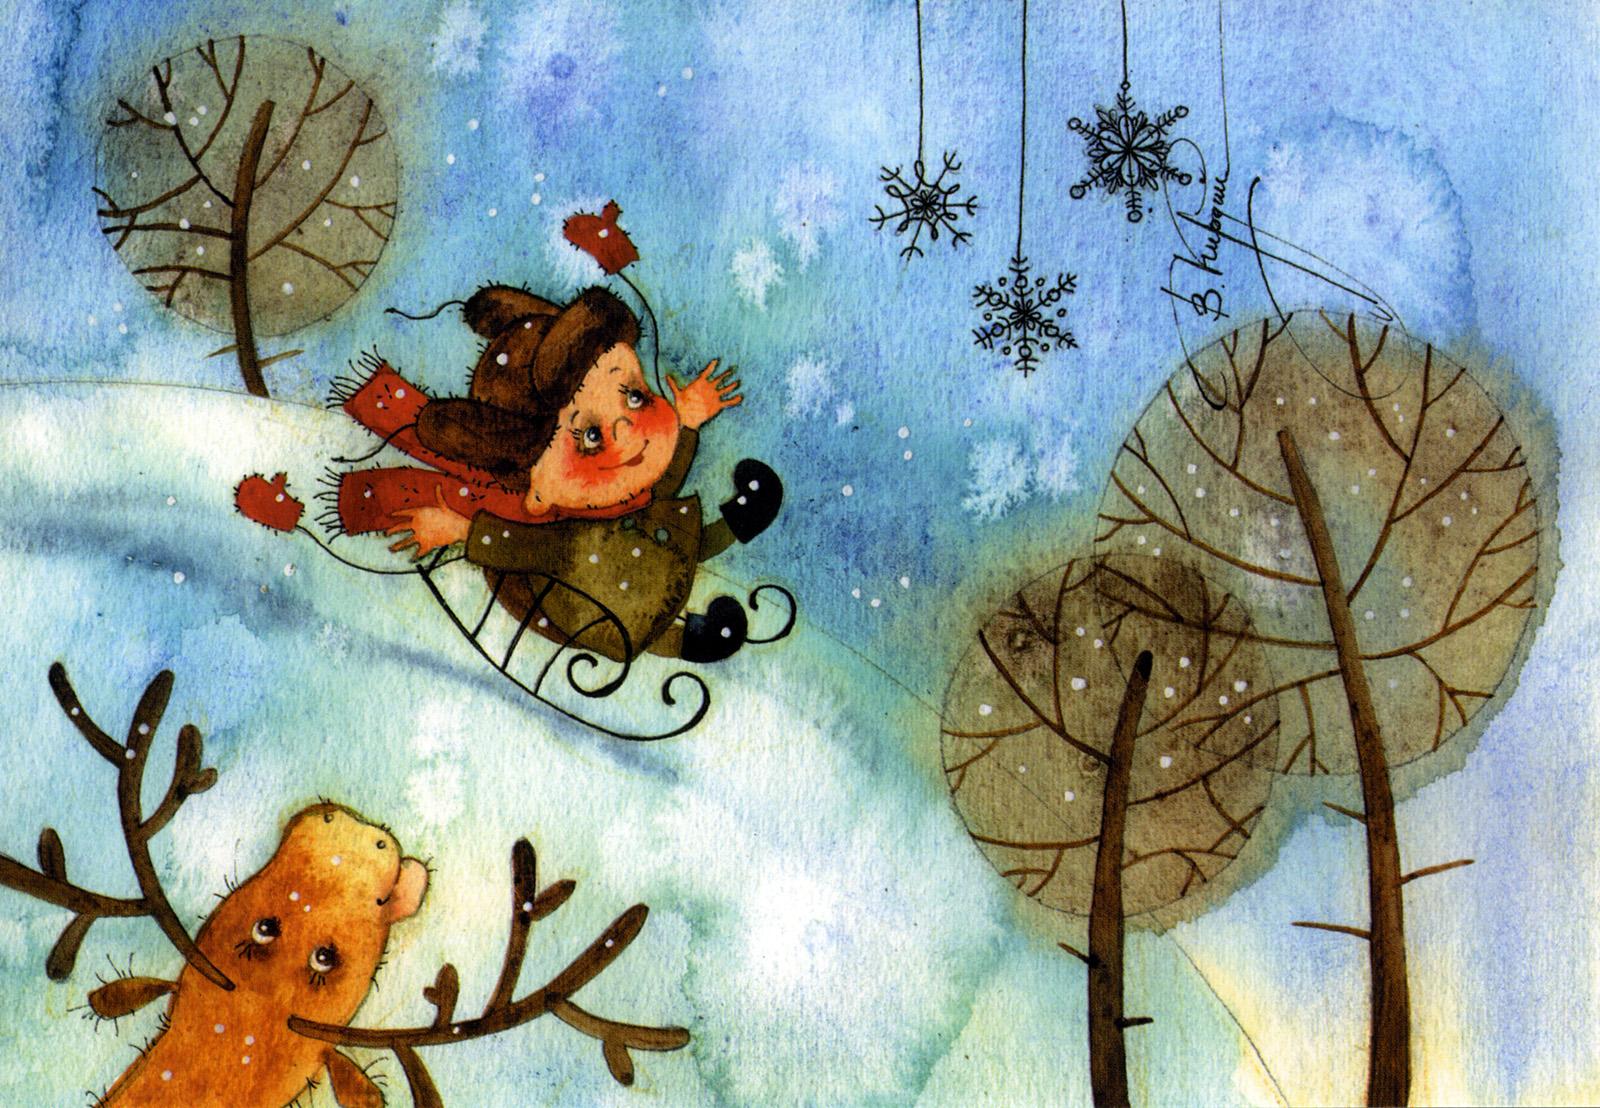 http://www.dana-mad.ru/gal/images/Victoria%20Kirdy/Calendar/victoria_kirdy_calendar_02_hill.jpg